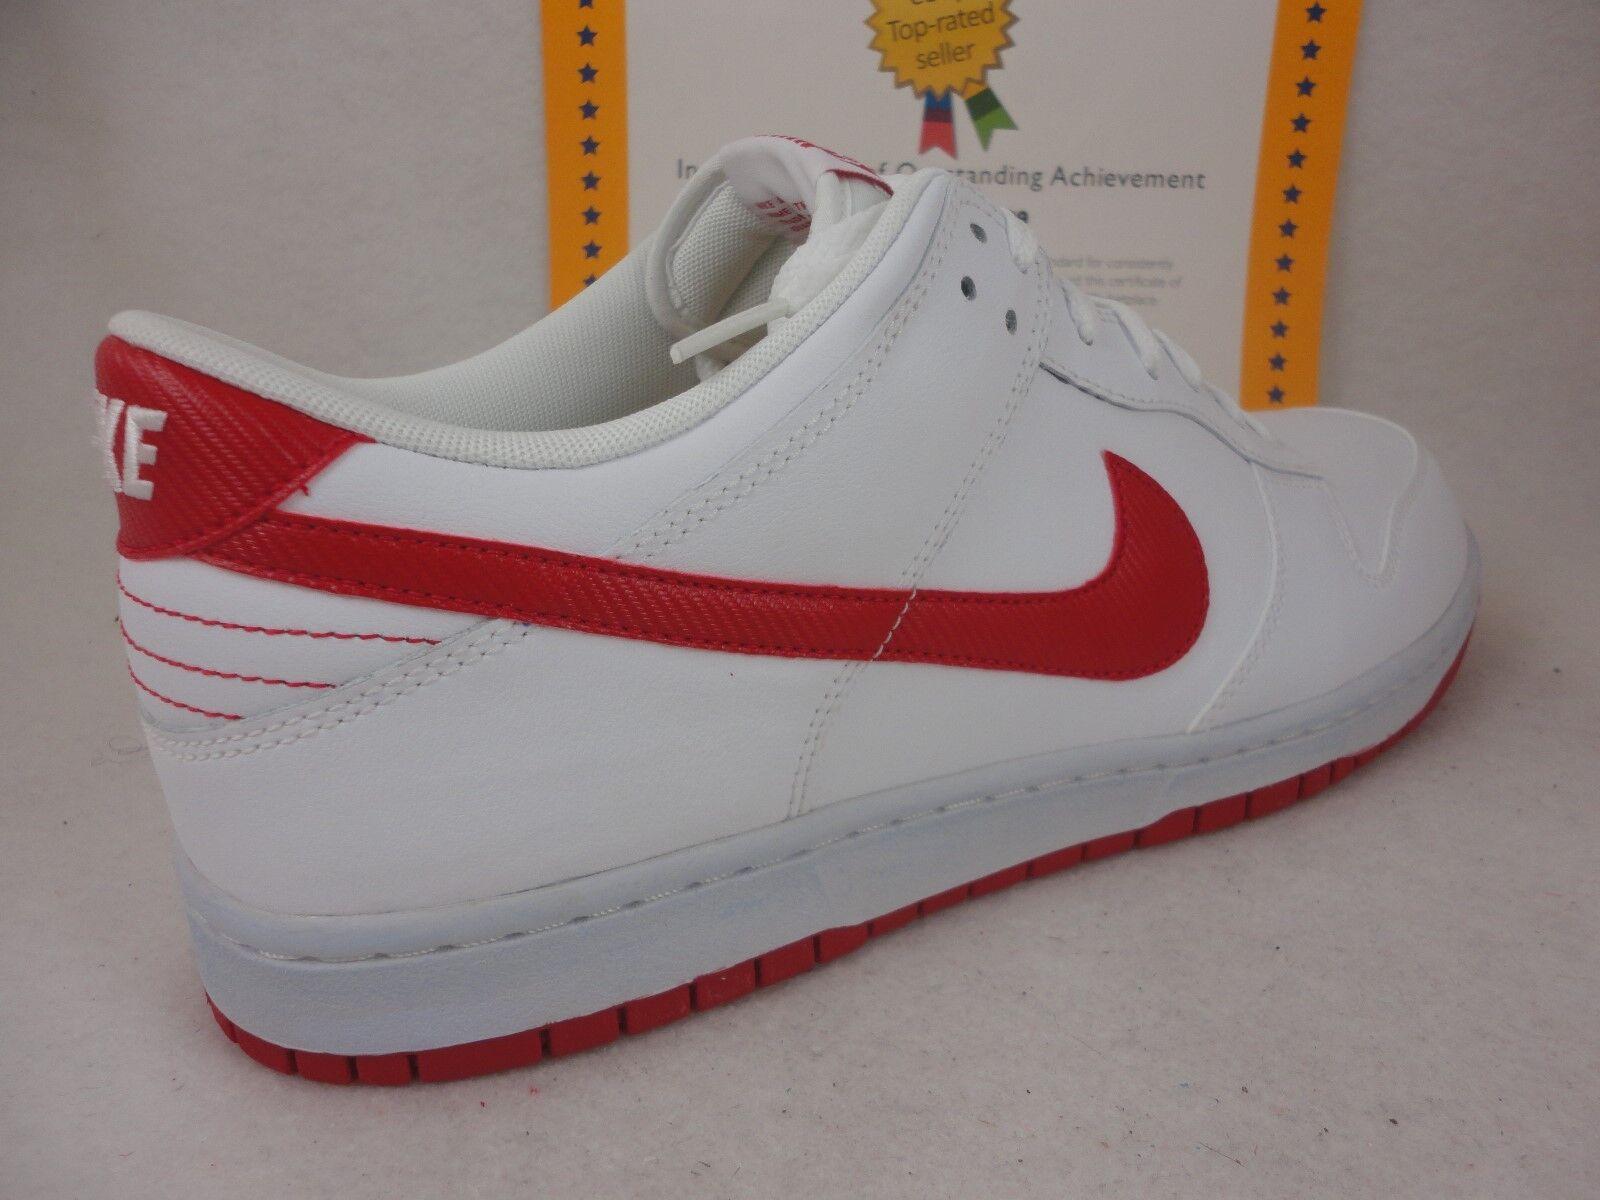 Nike piu 'basso, cuoio, 2012, white / sport rosso, 318019 108, sz 13